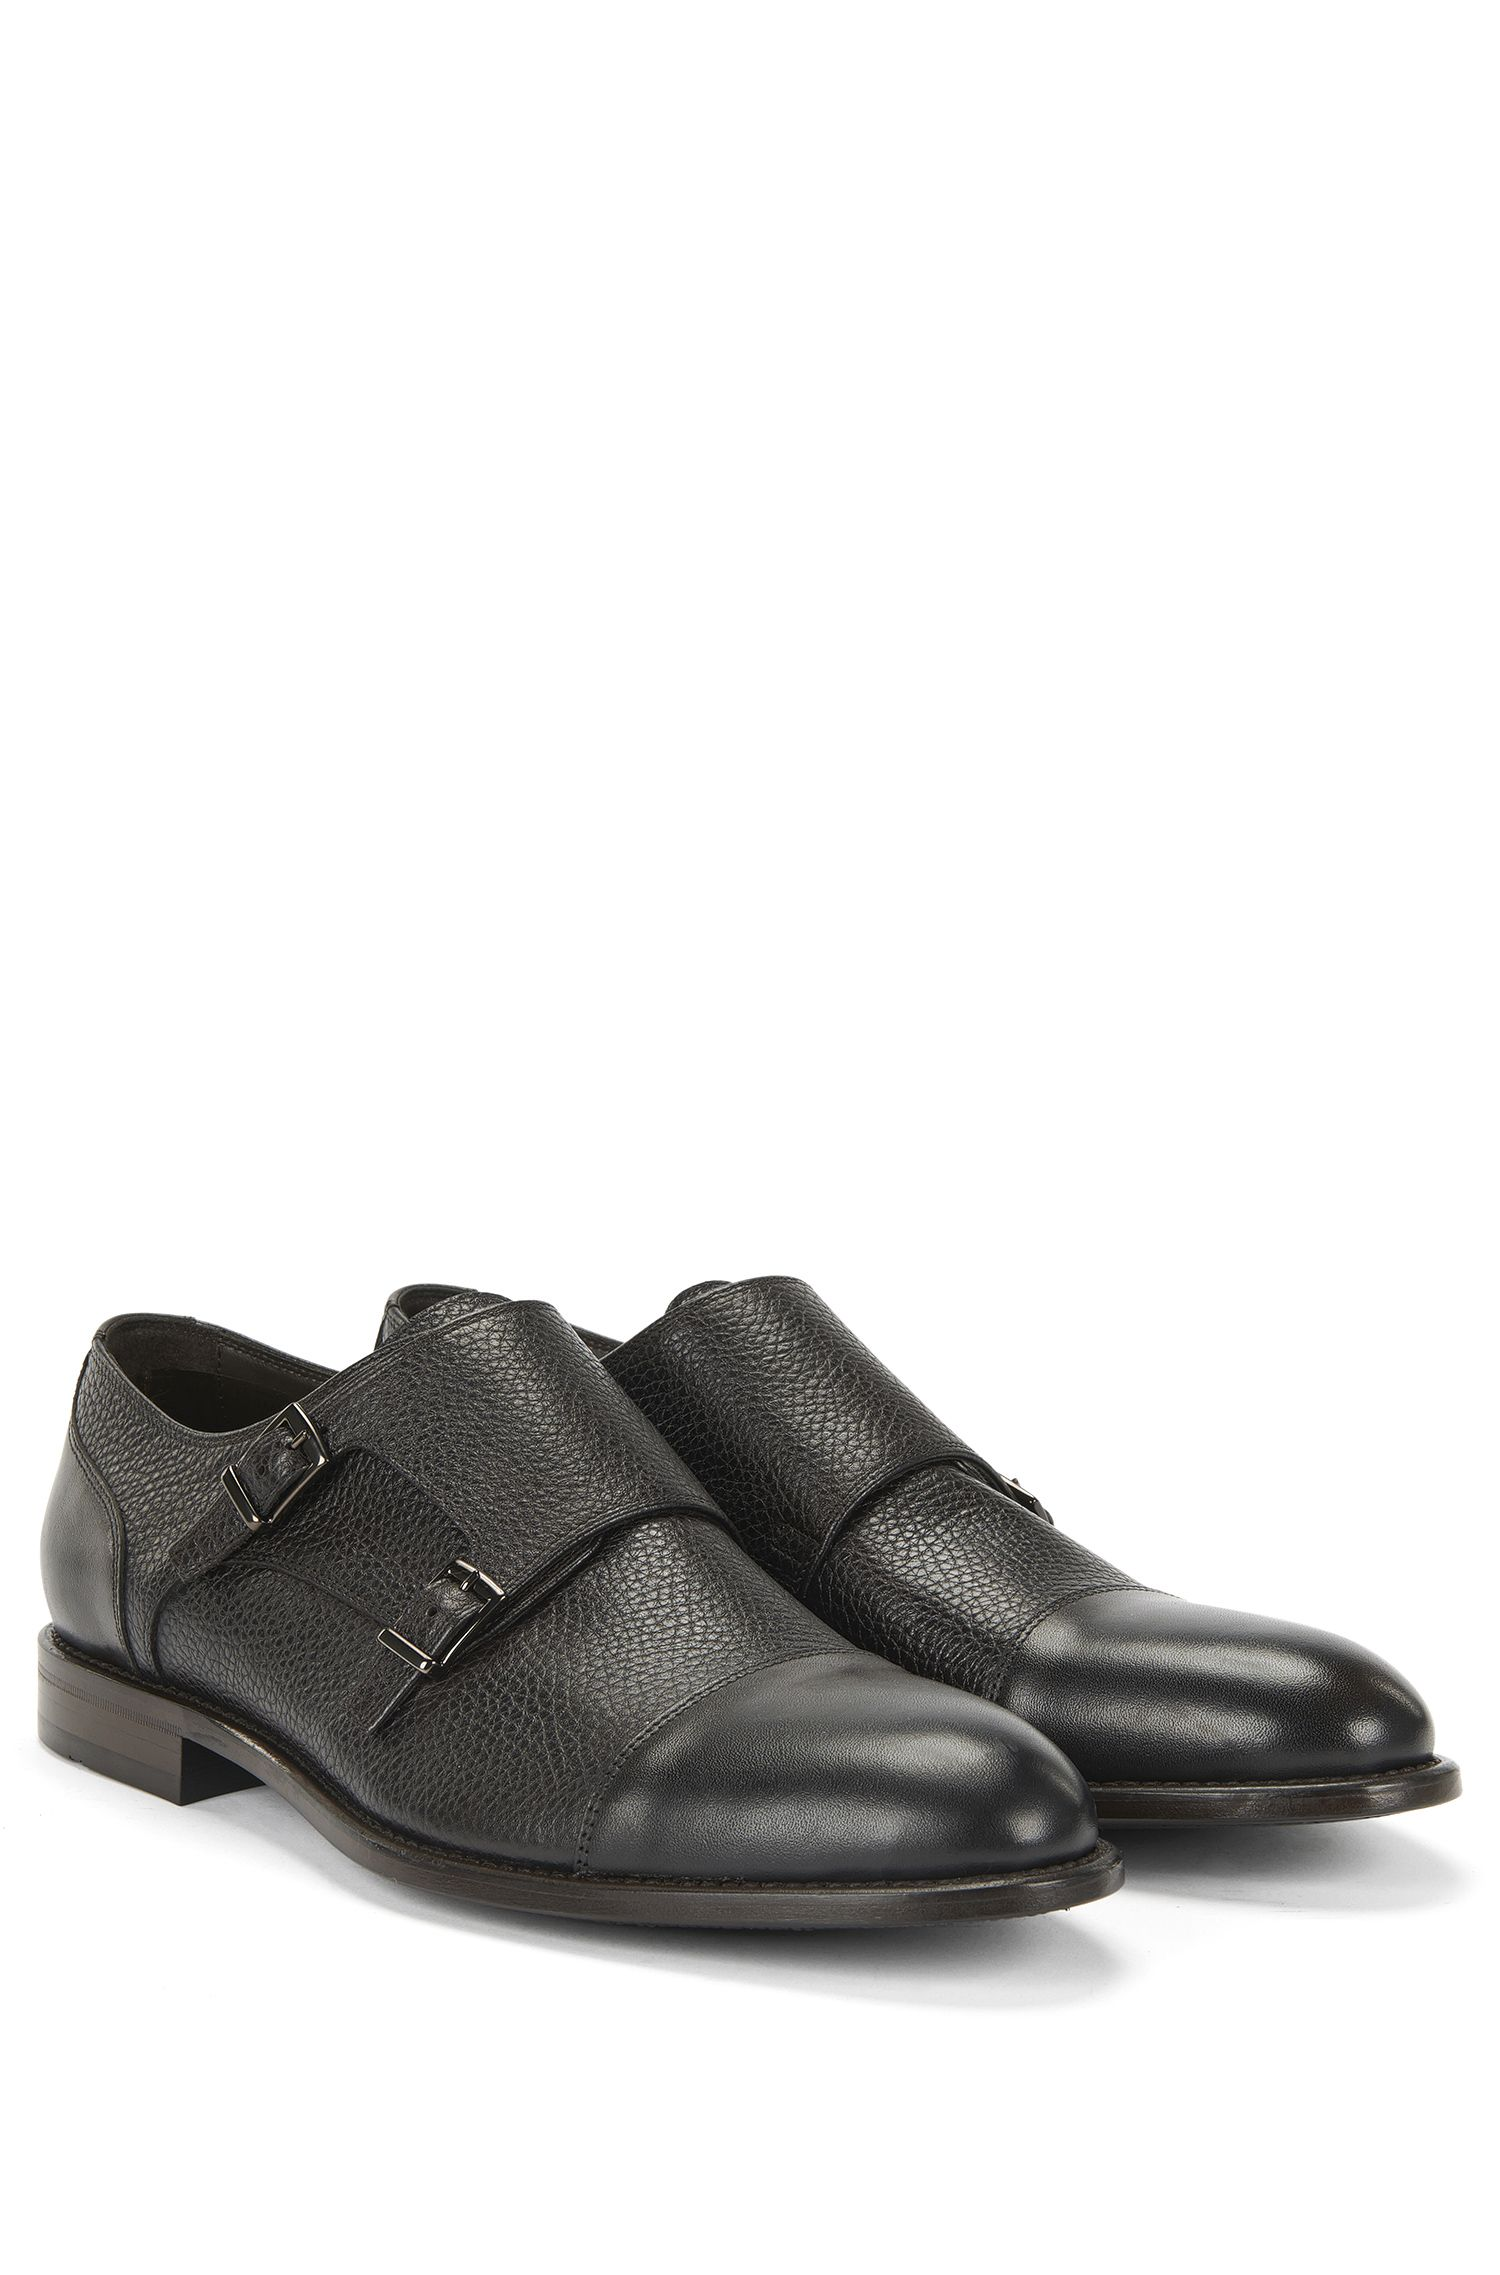 'Stockholm Monk Mxct' | Italian Calfskin Double Monk Strap Dress Shoes